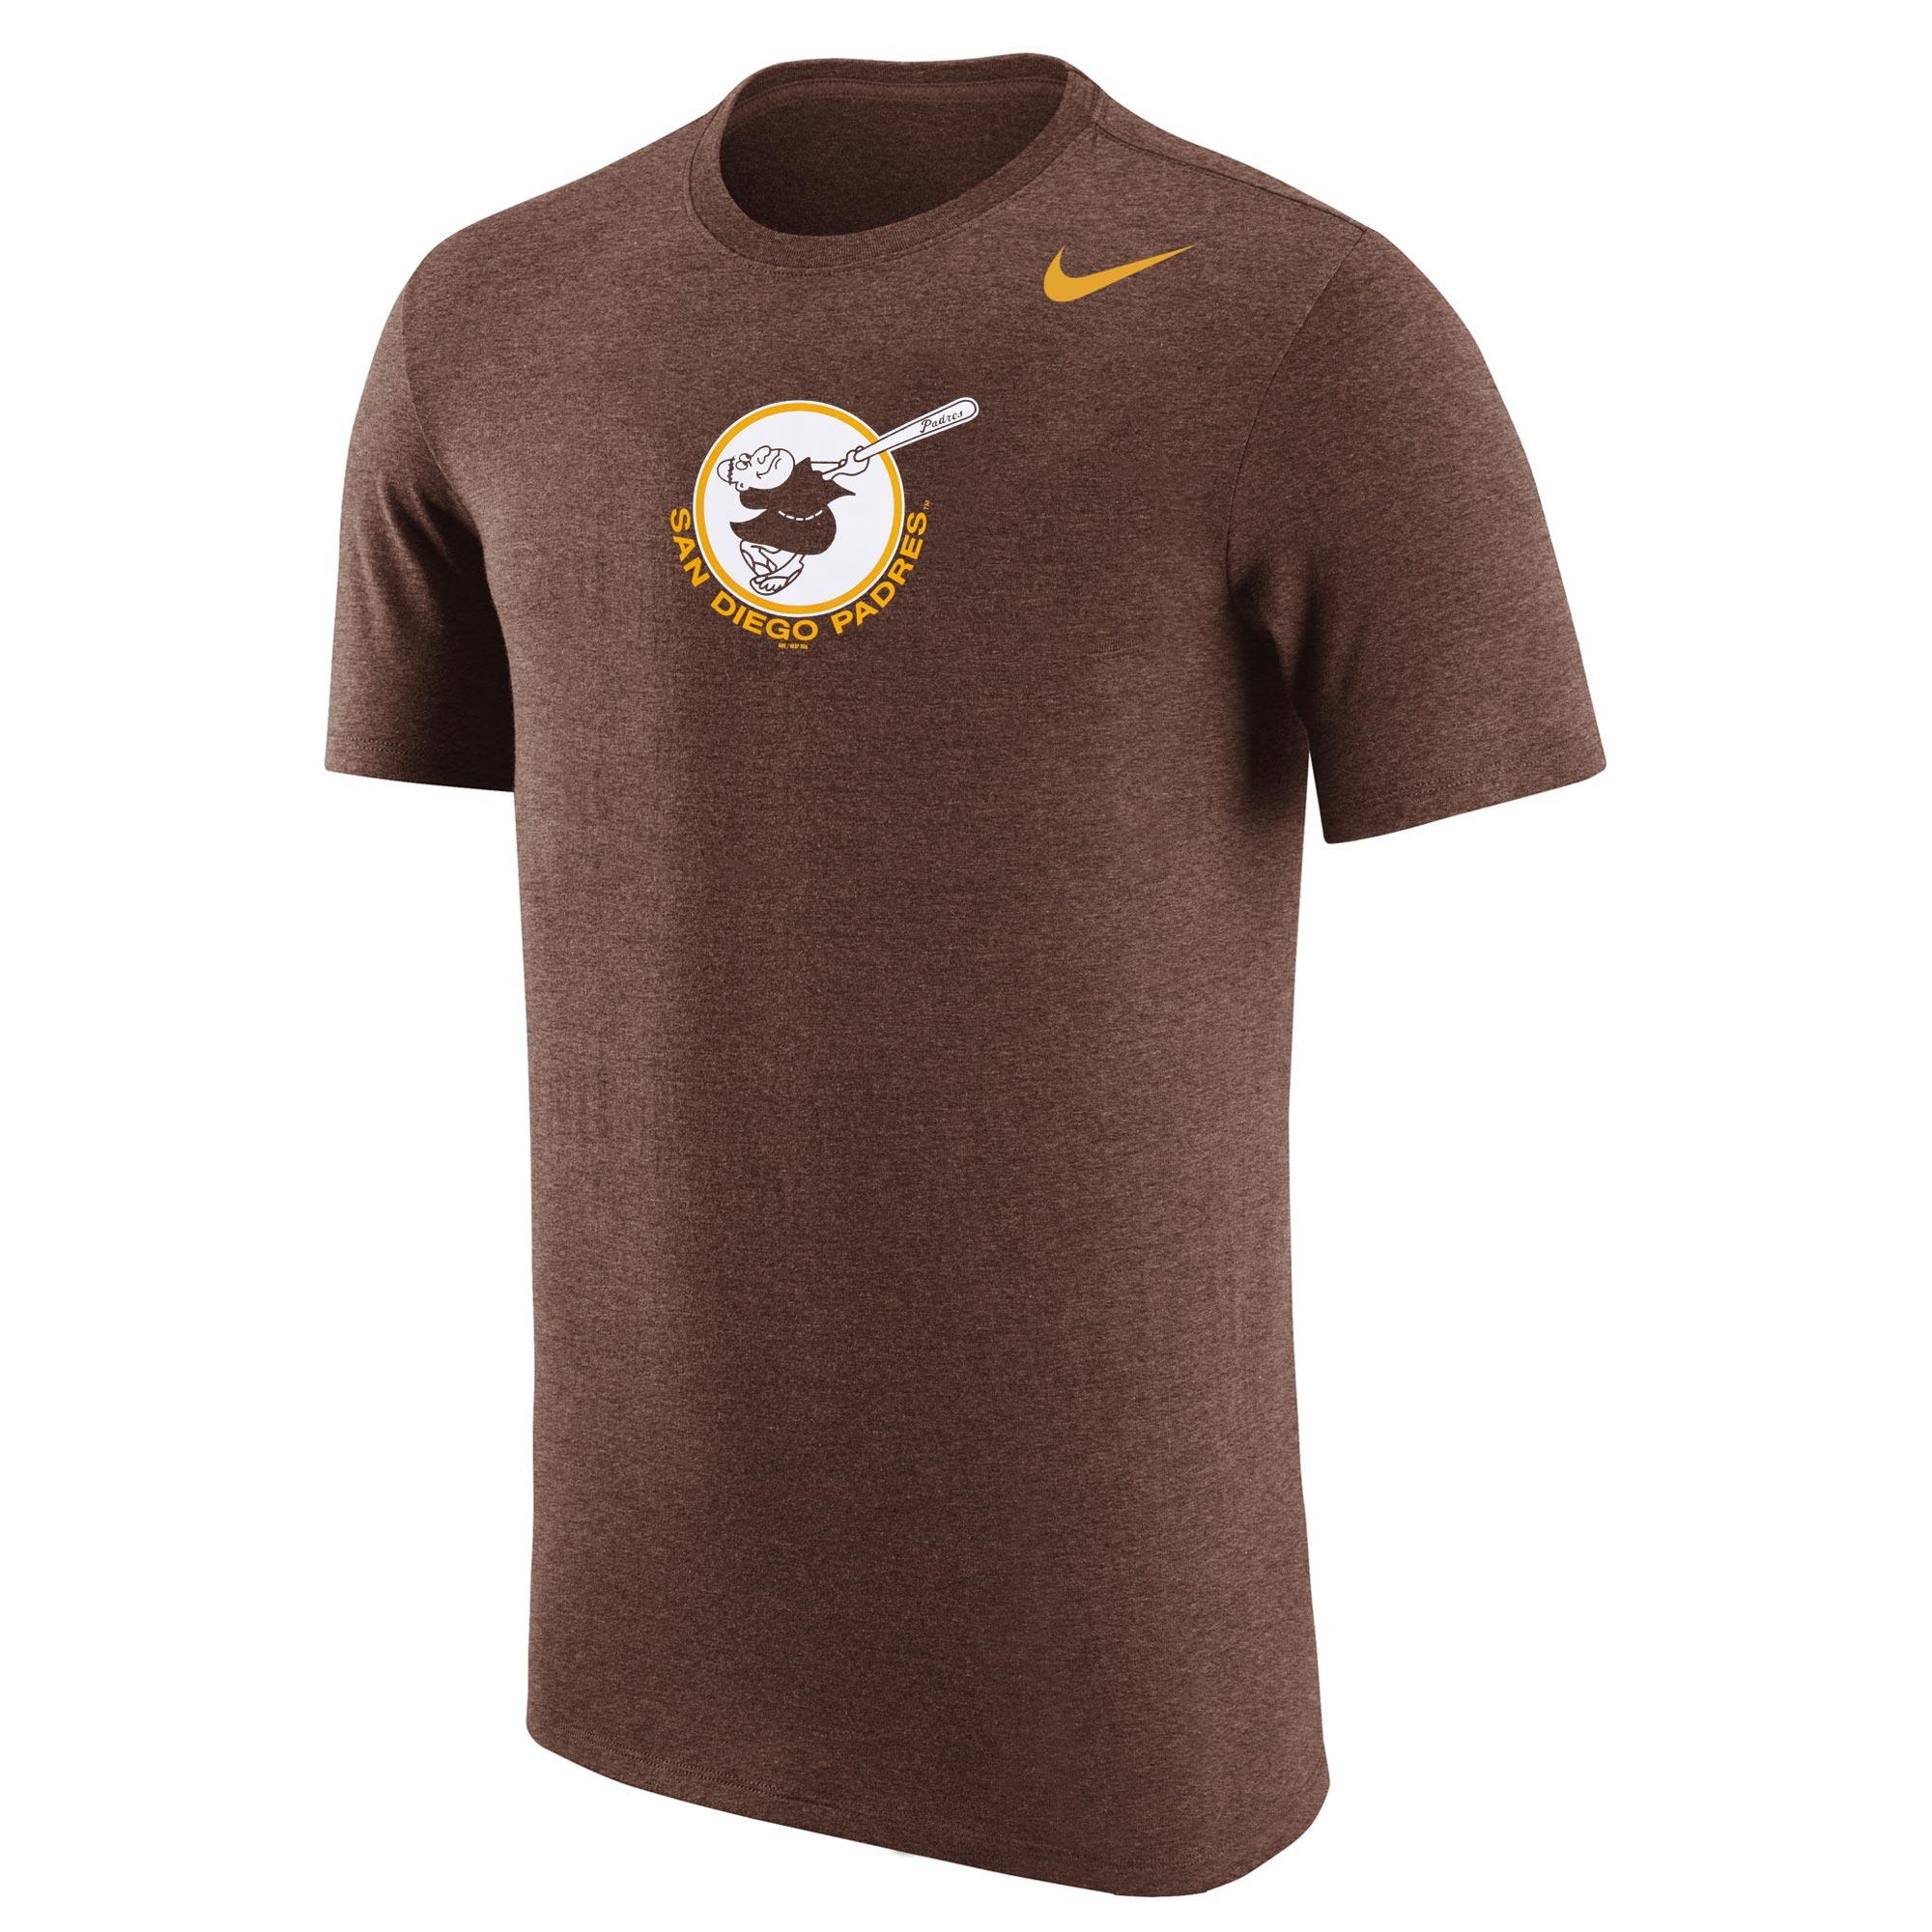 Men's Nike Brown San Diego Padres Cooperstown Retro Logo Tri-Blend T-Shirt